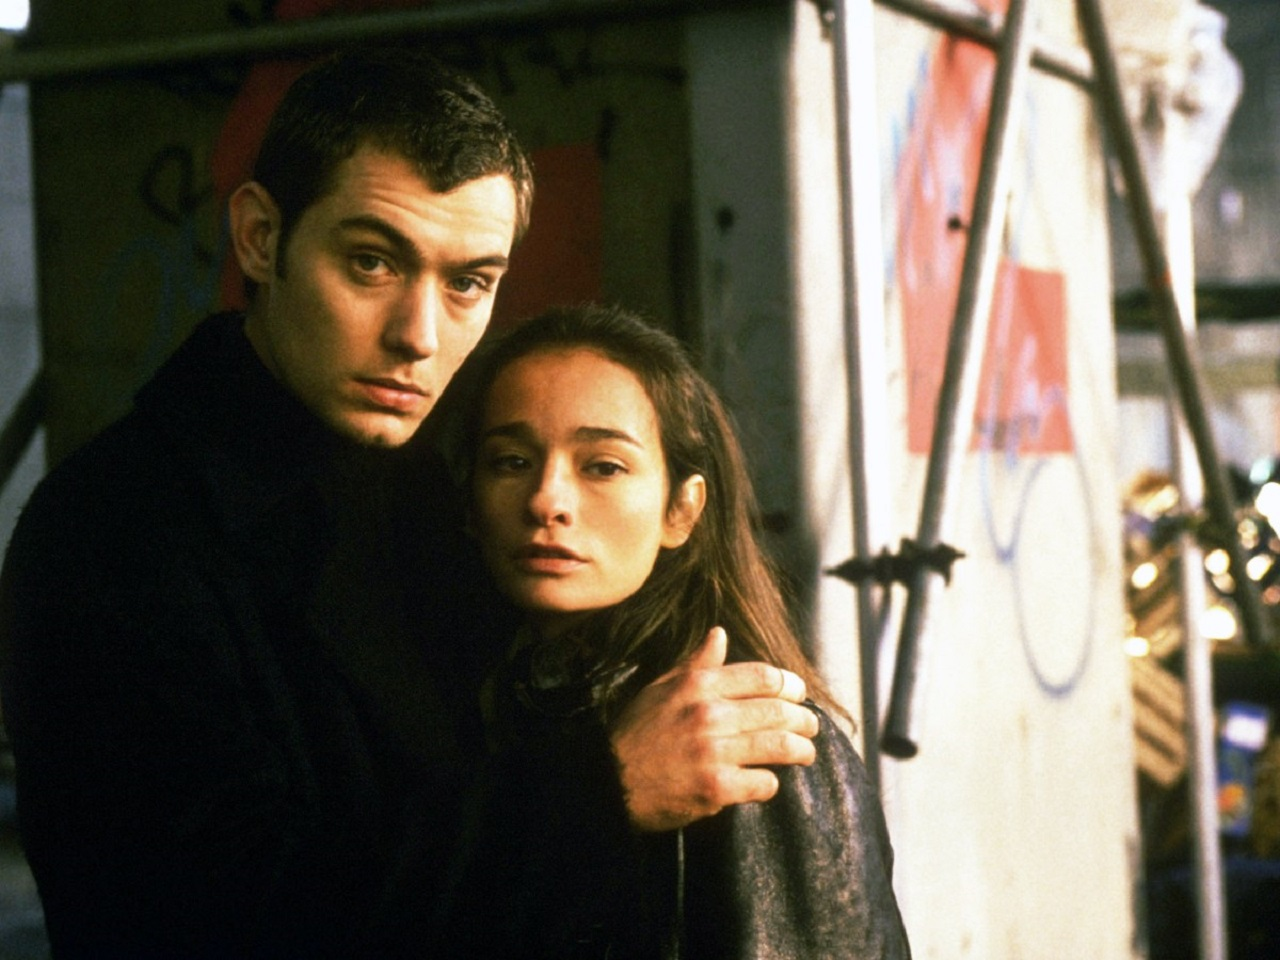 Jude Law and Elina Löwensohn in The Wisdom of Crocodiles (1998)